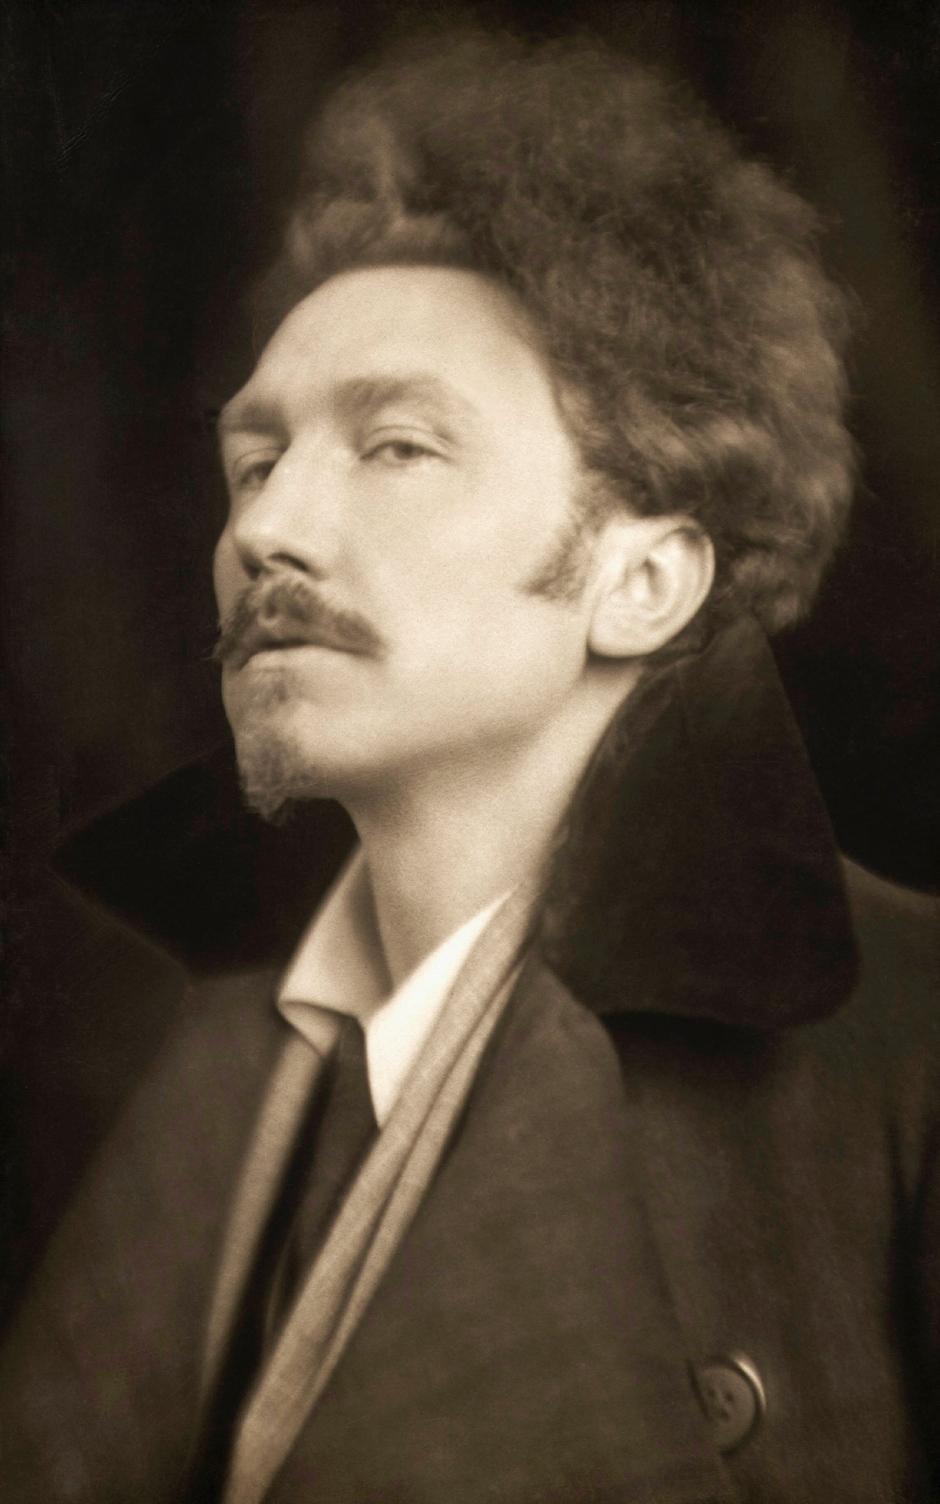 Poeti Ezra Pund